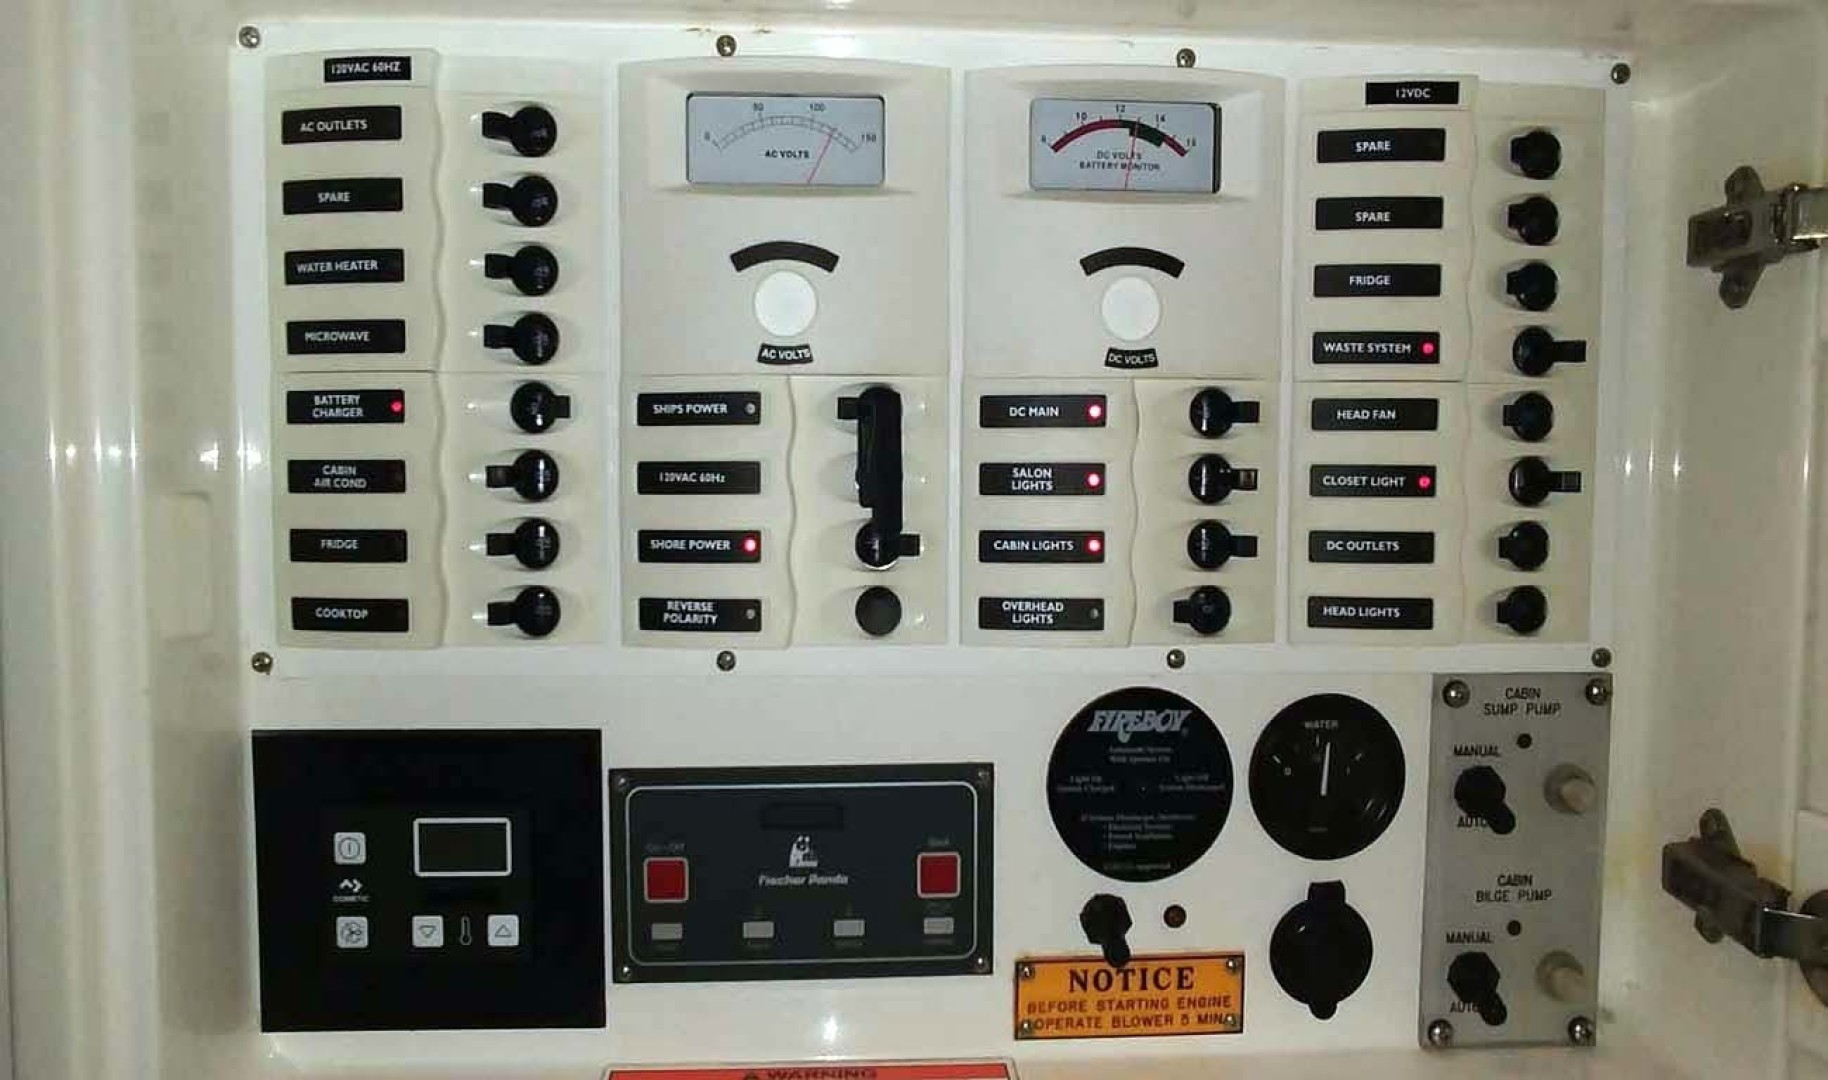 Intrepid-377 Walkaround 2006 -Pompano Beach-Florida-United States-Electrical Panel-1322766   Thumbnail